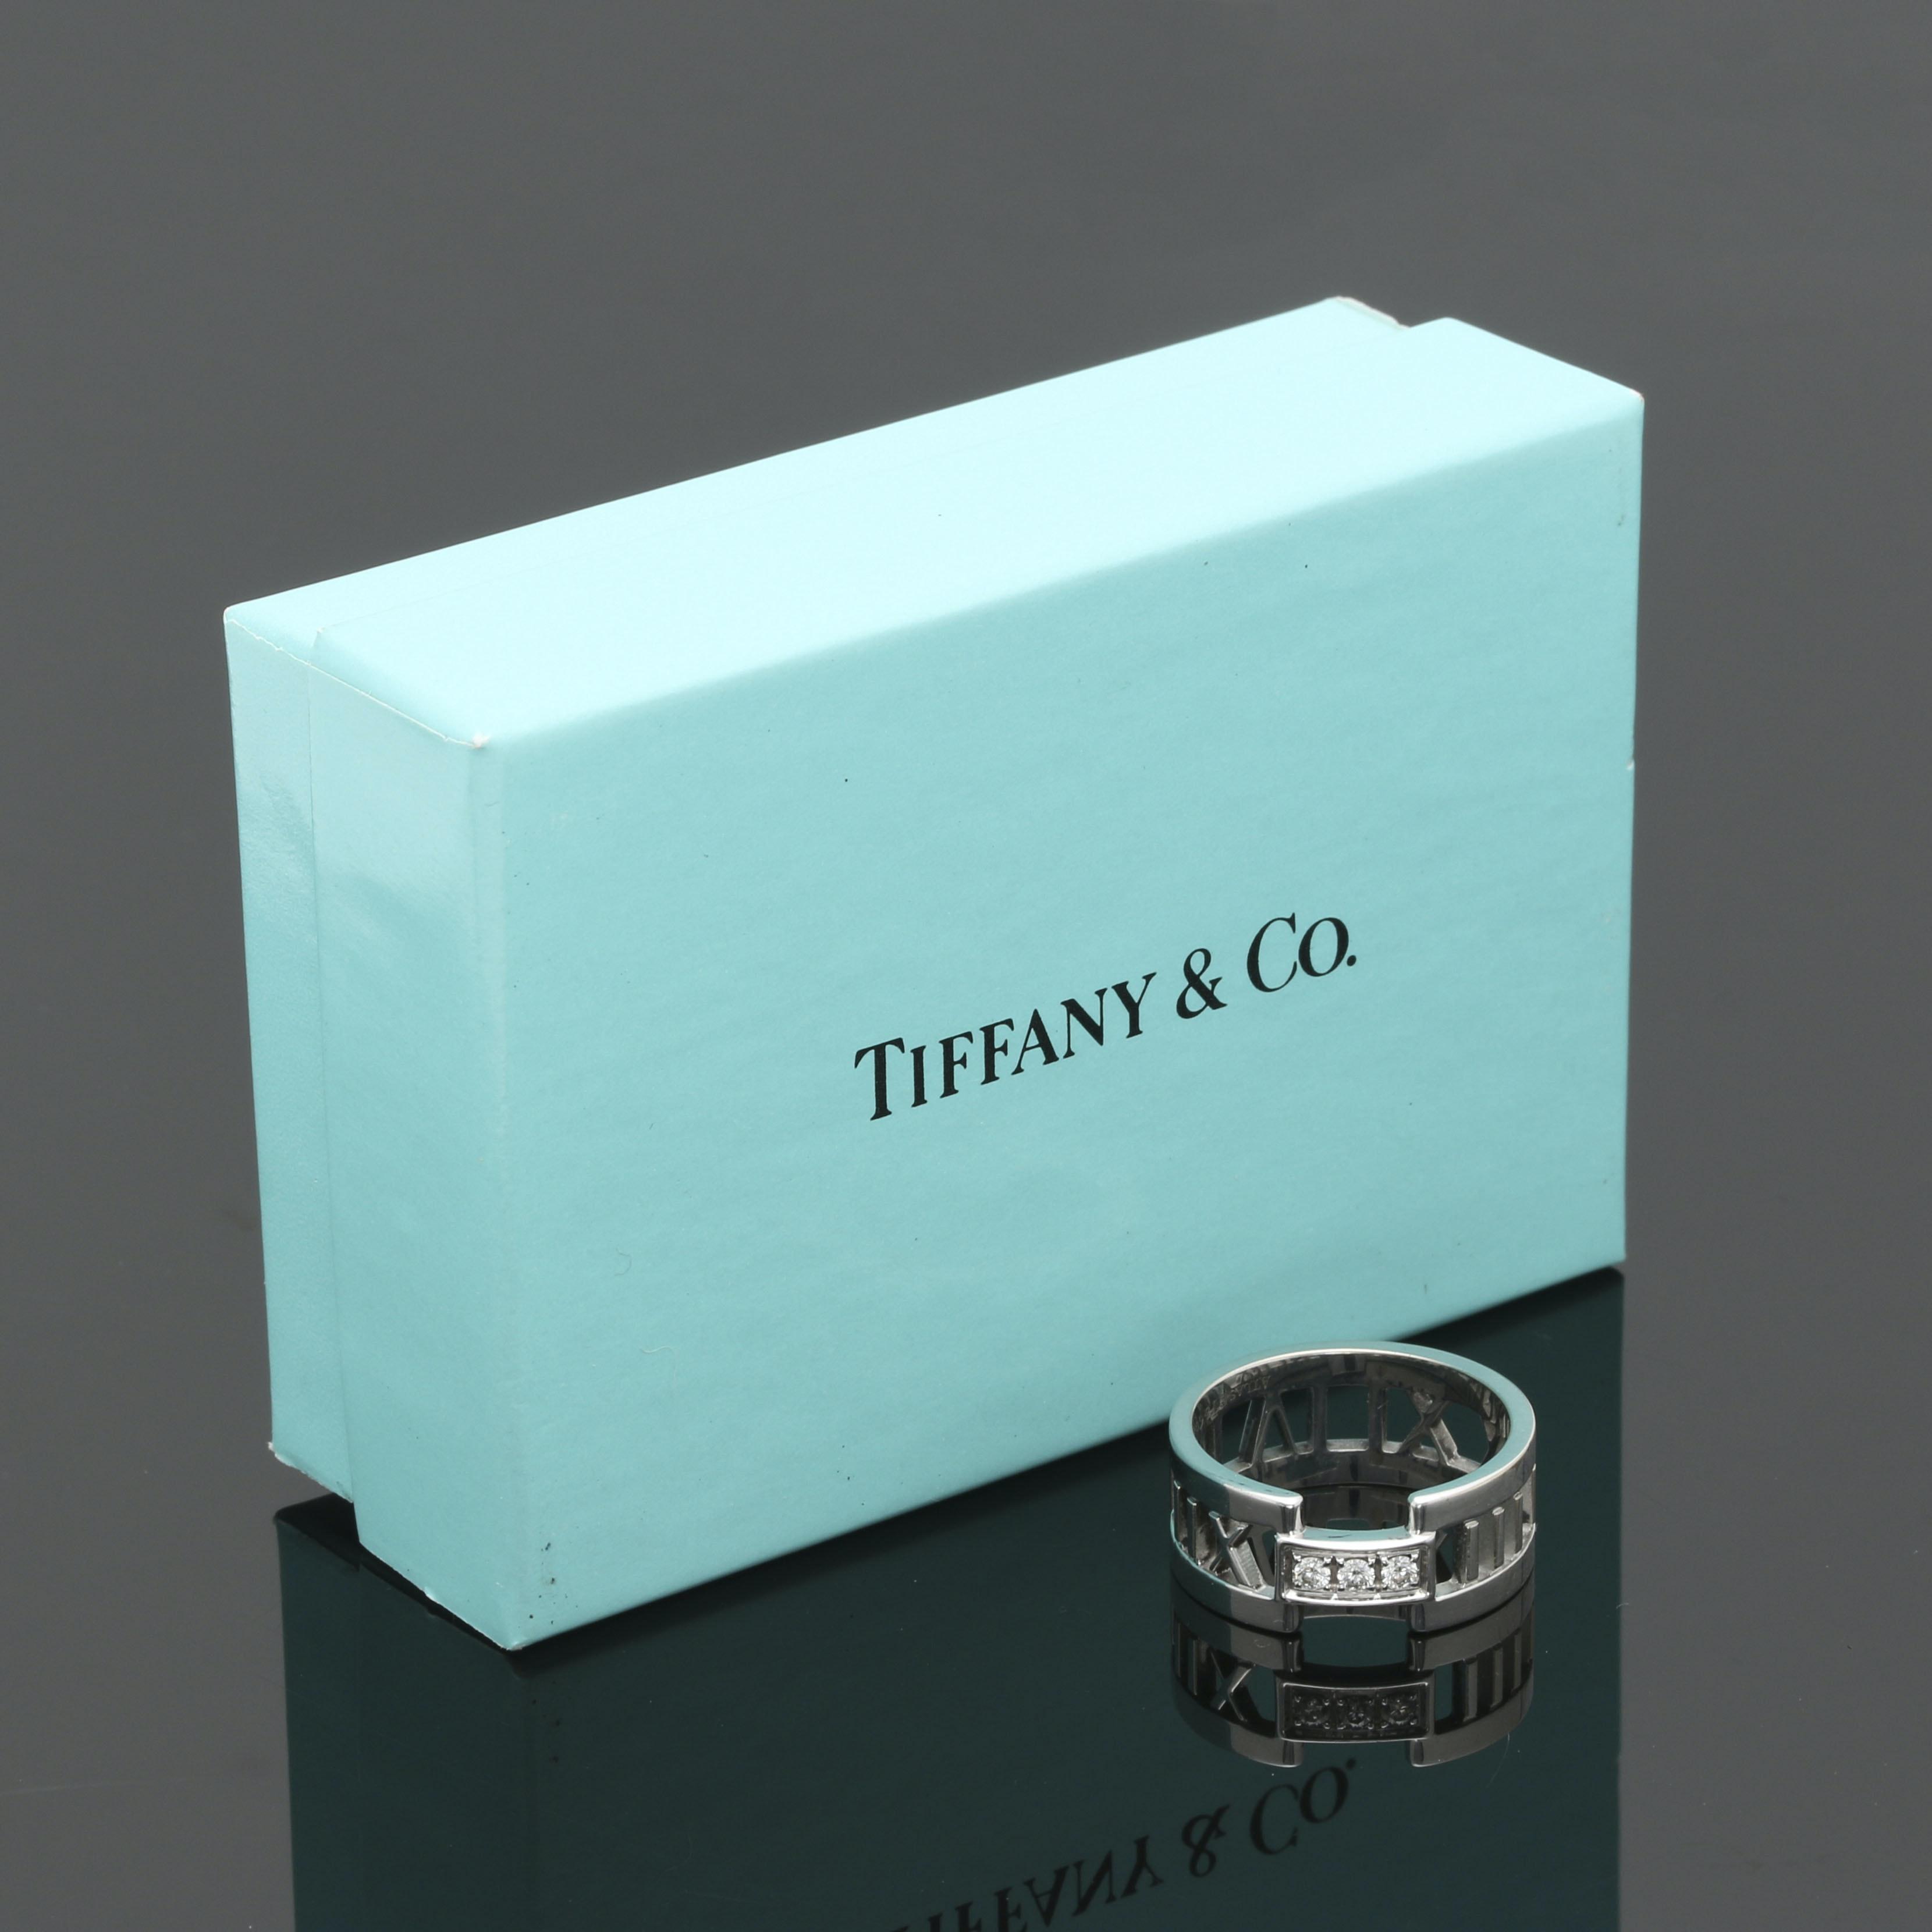 "Tiffany & Co. 18K White Gold Diamond Roman Numeral ""Atlas"" Ring"